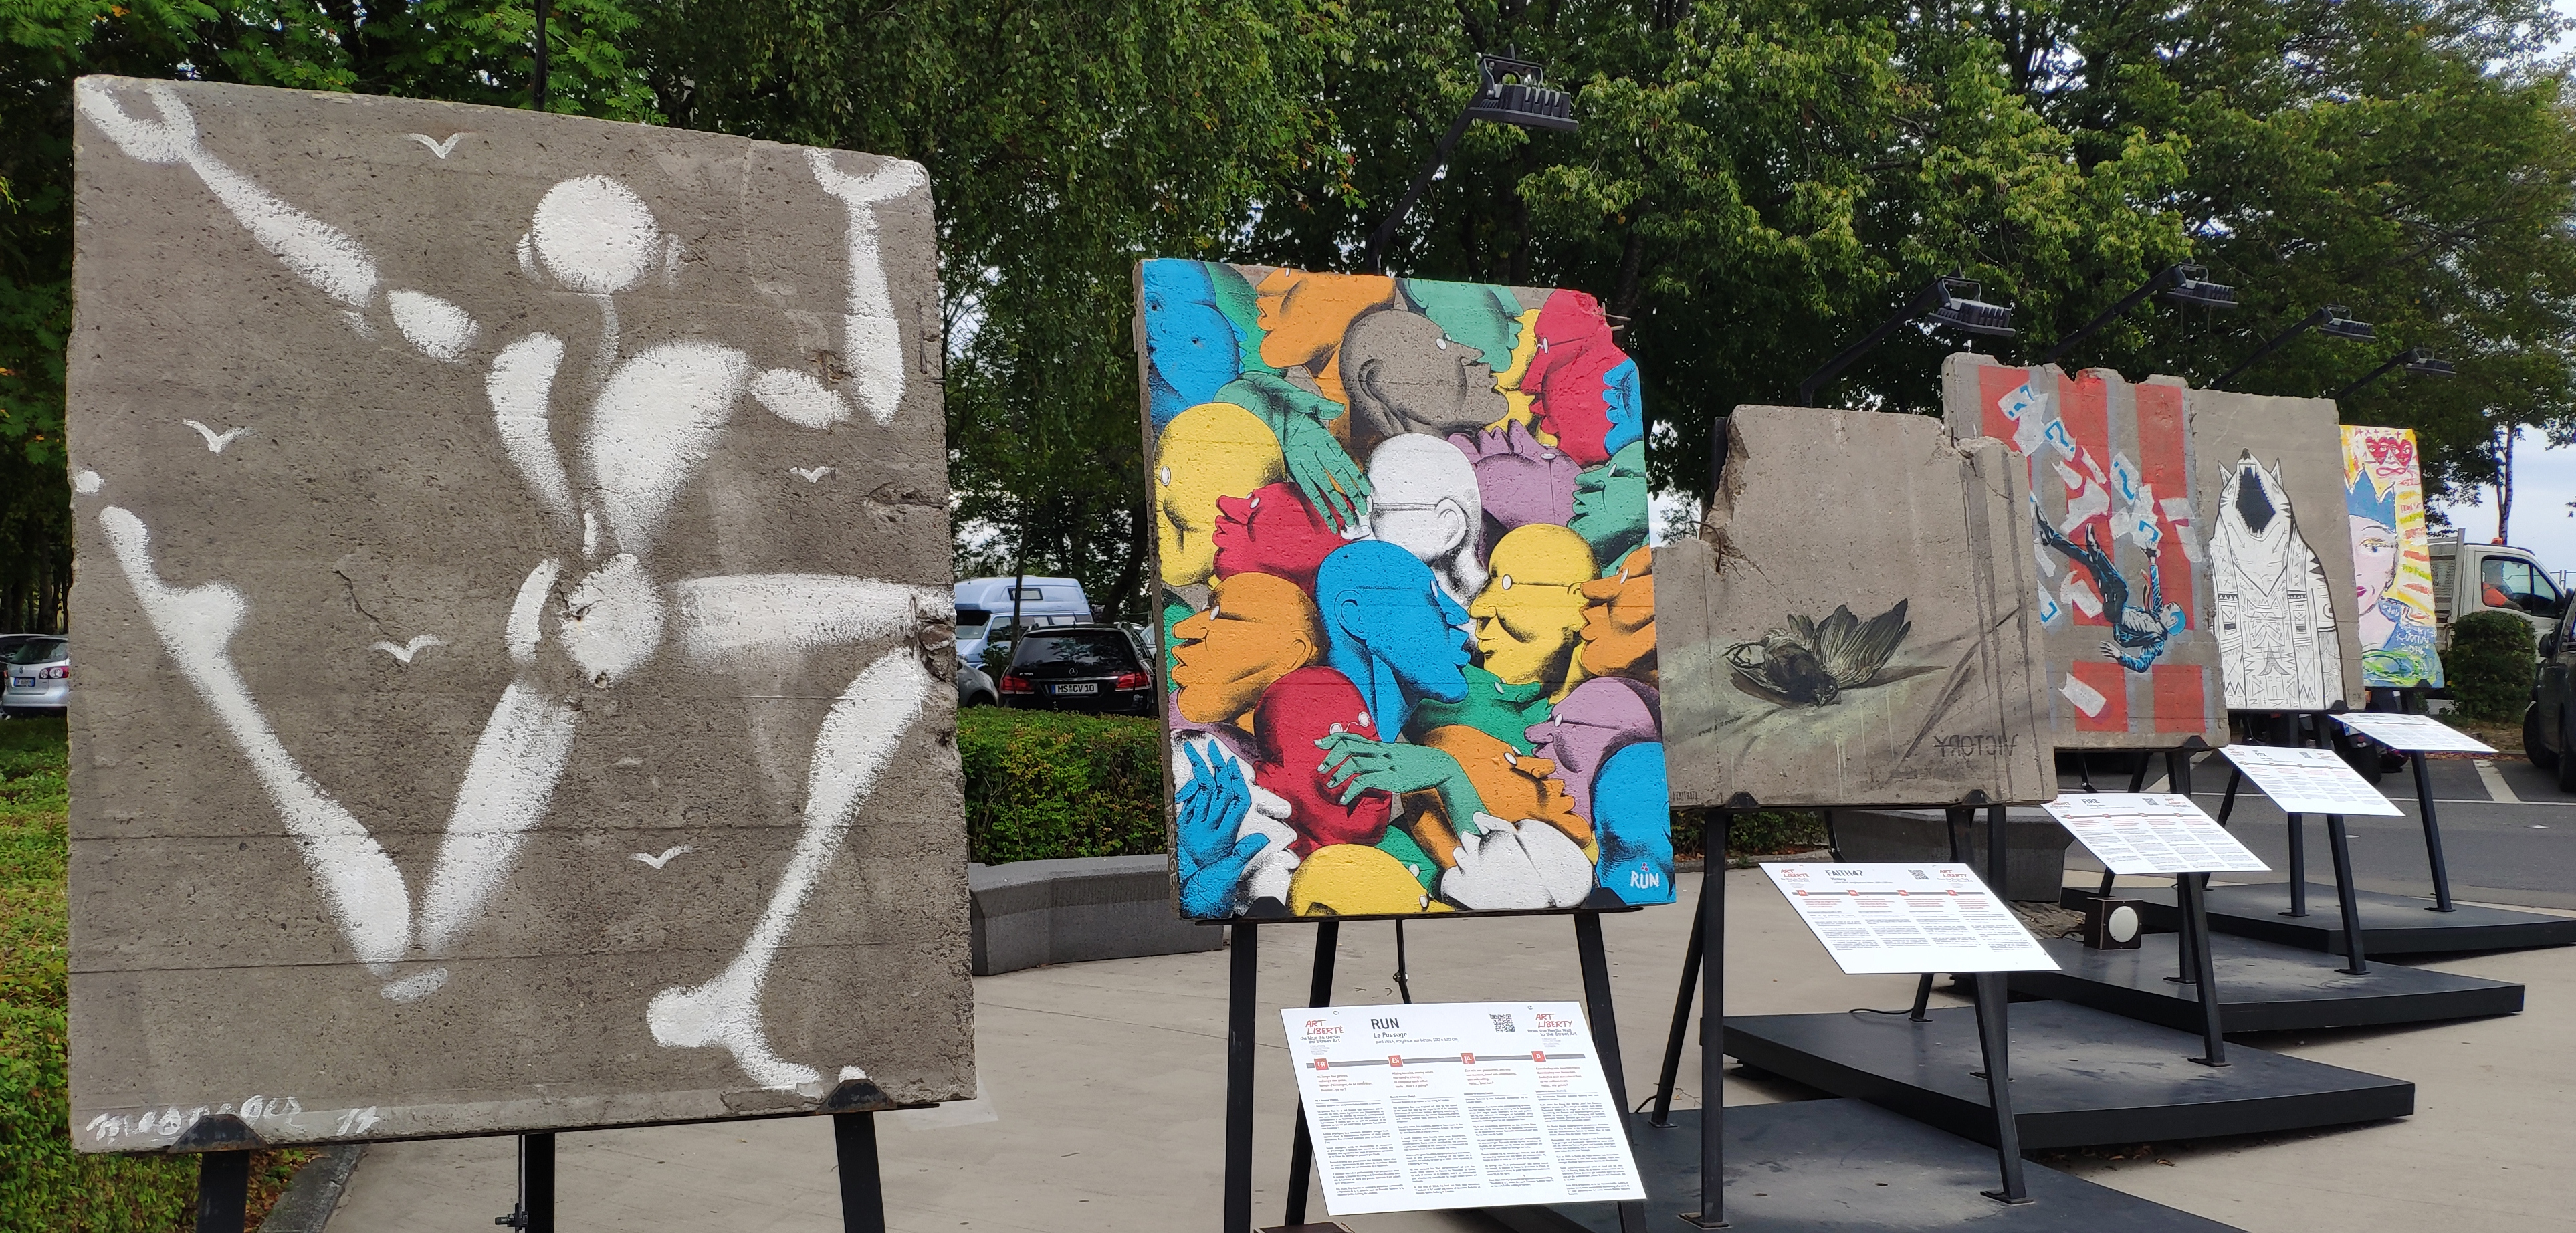 Art Liberty, from the Berlin Wall to Street Art